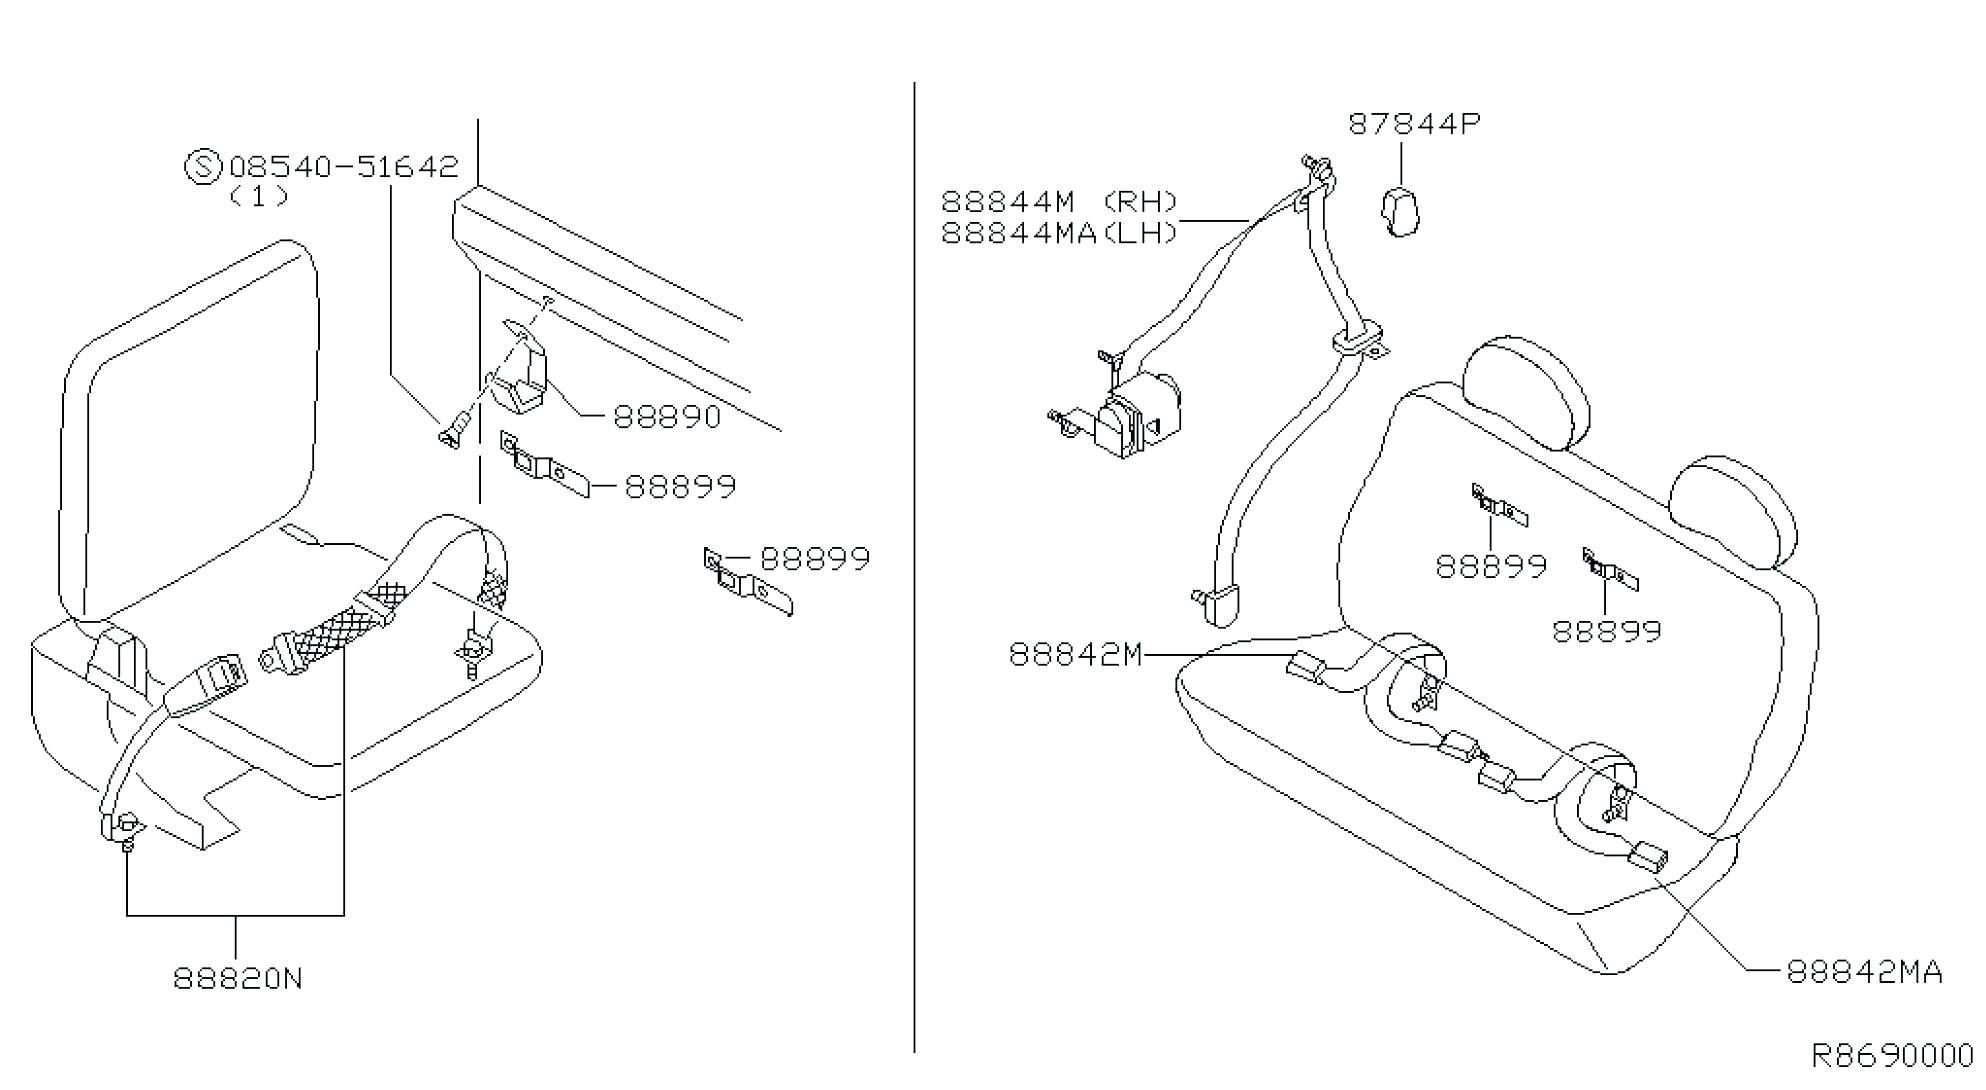 wiring diagram shunt trip breaker free download wiring diagram